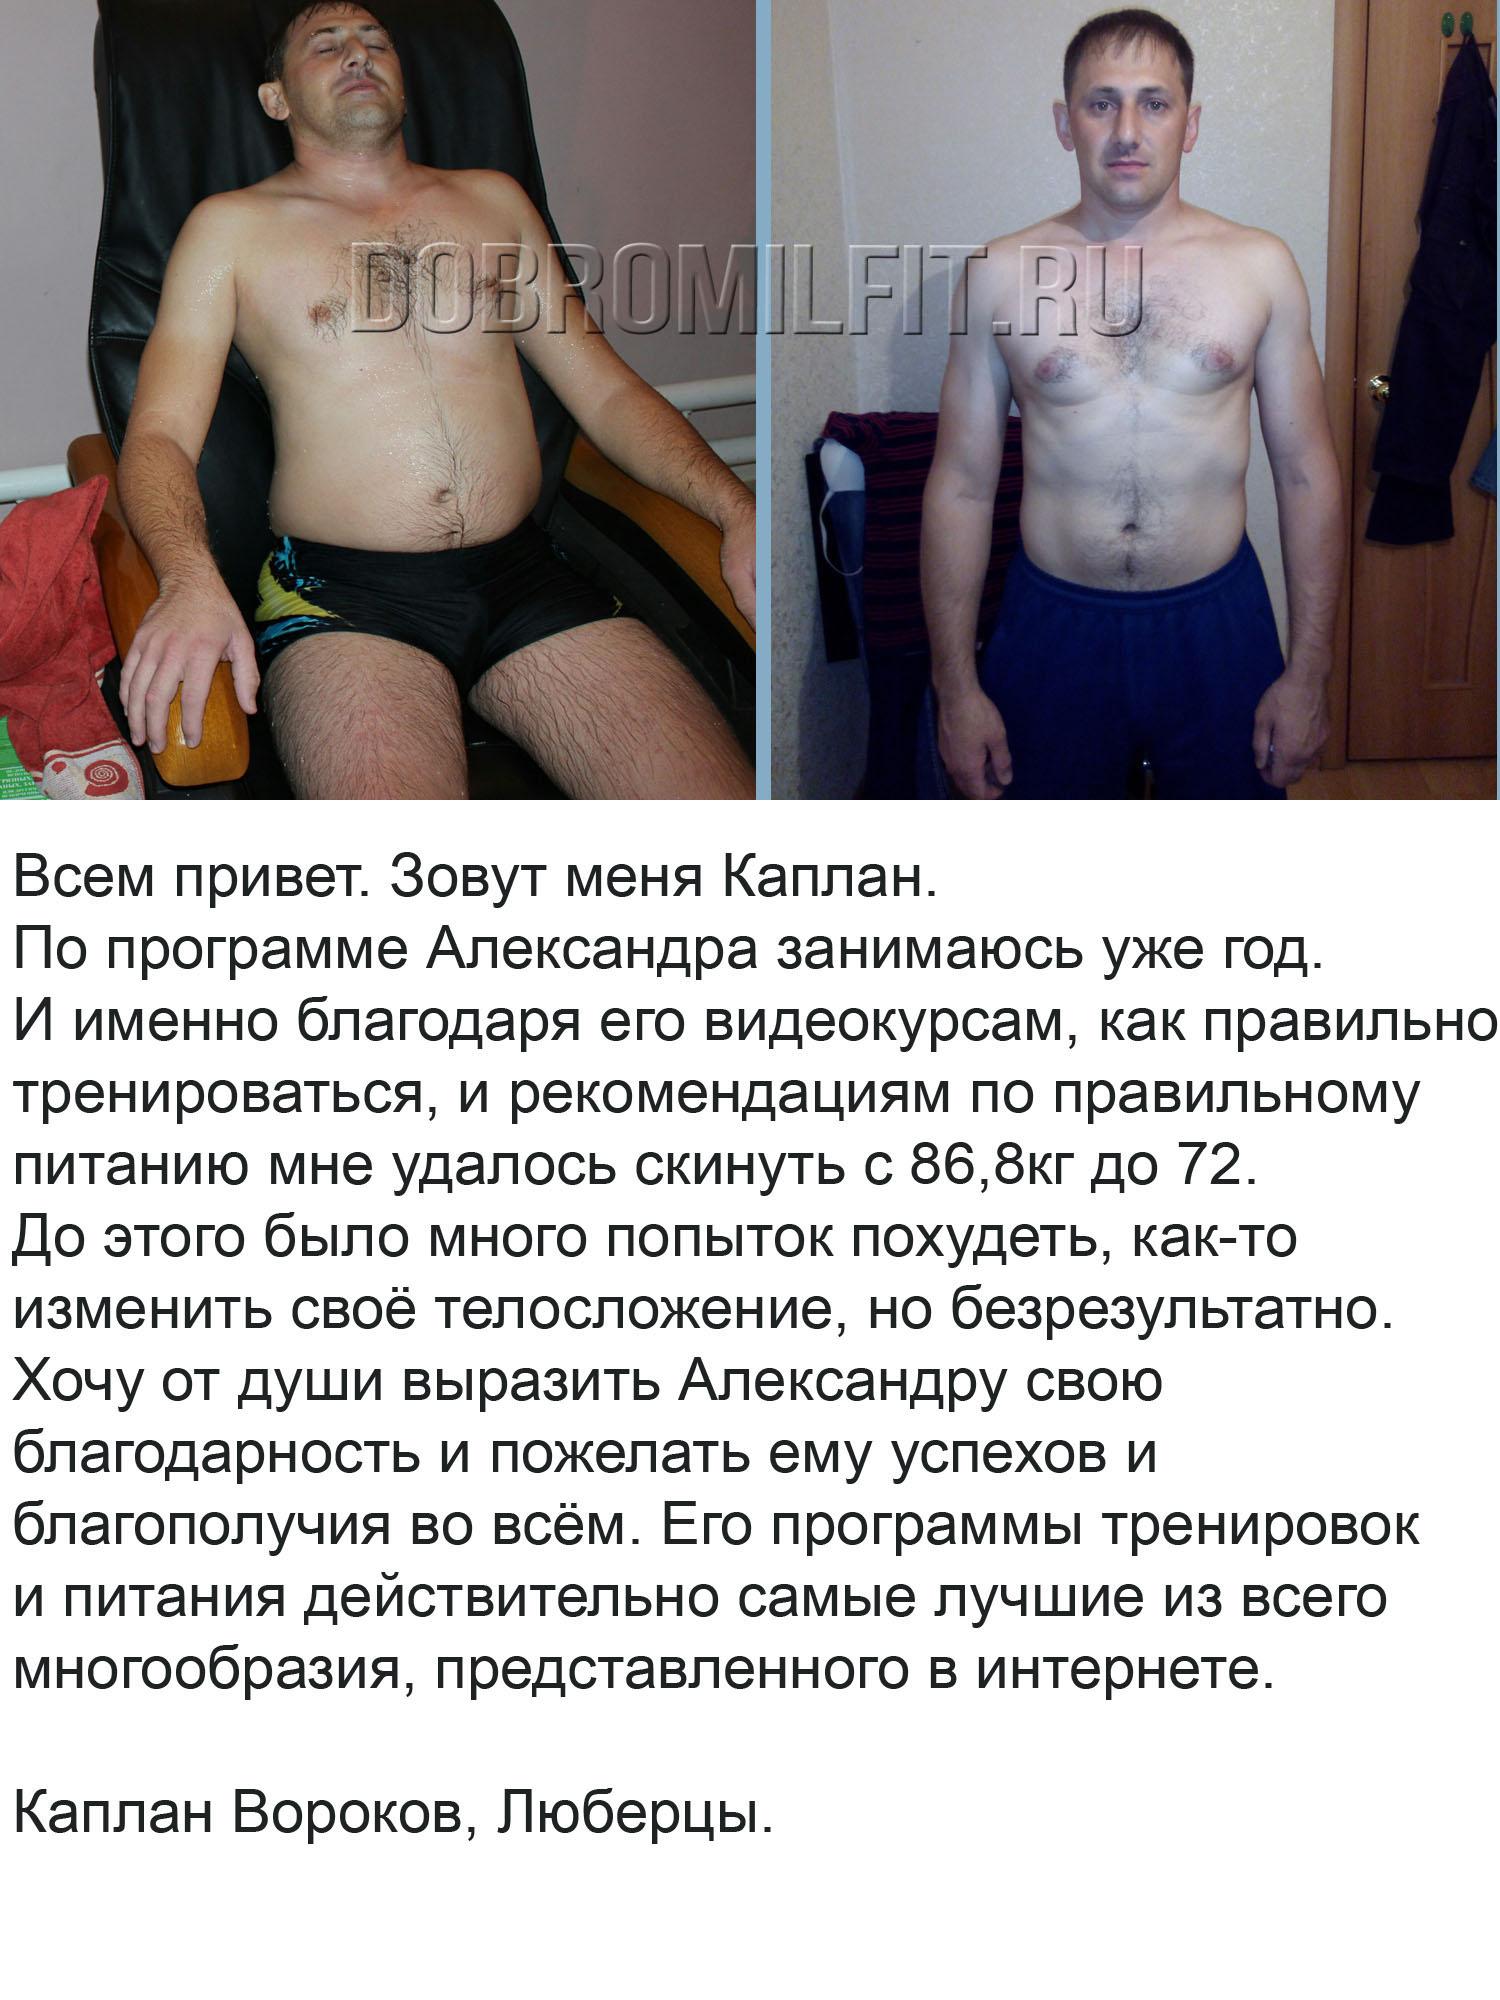 Каплан Вороков2